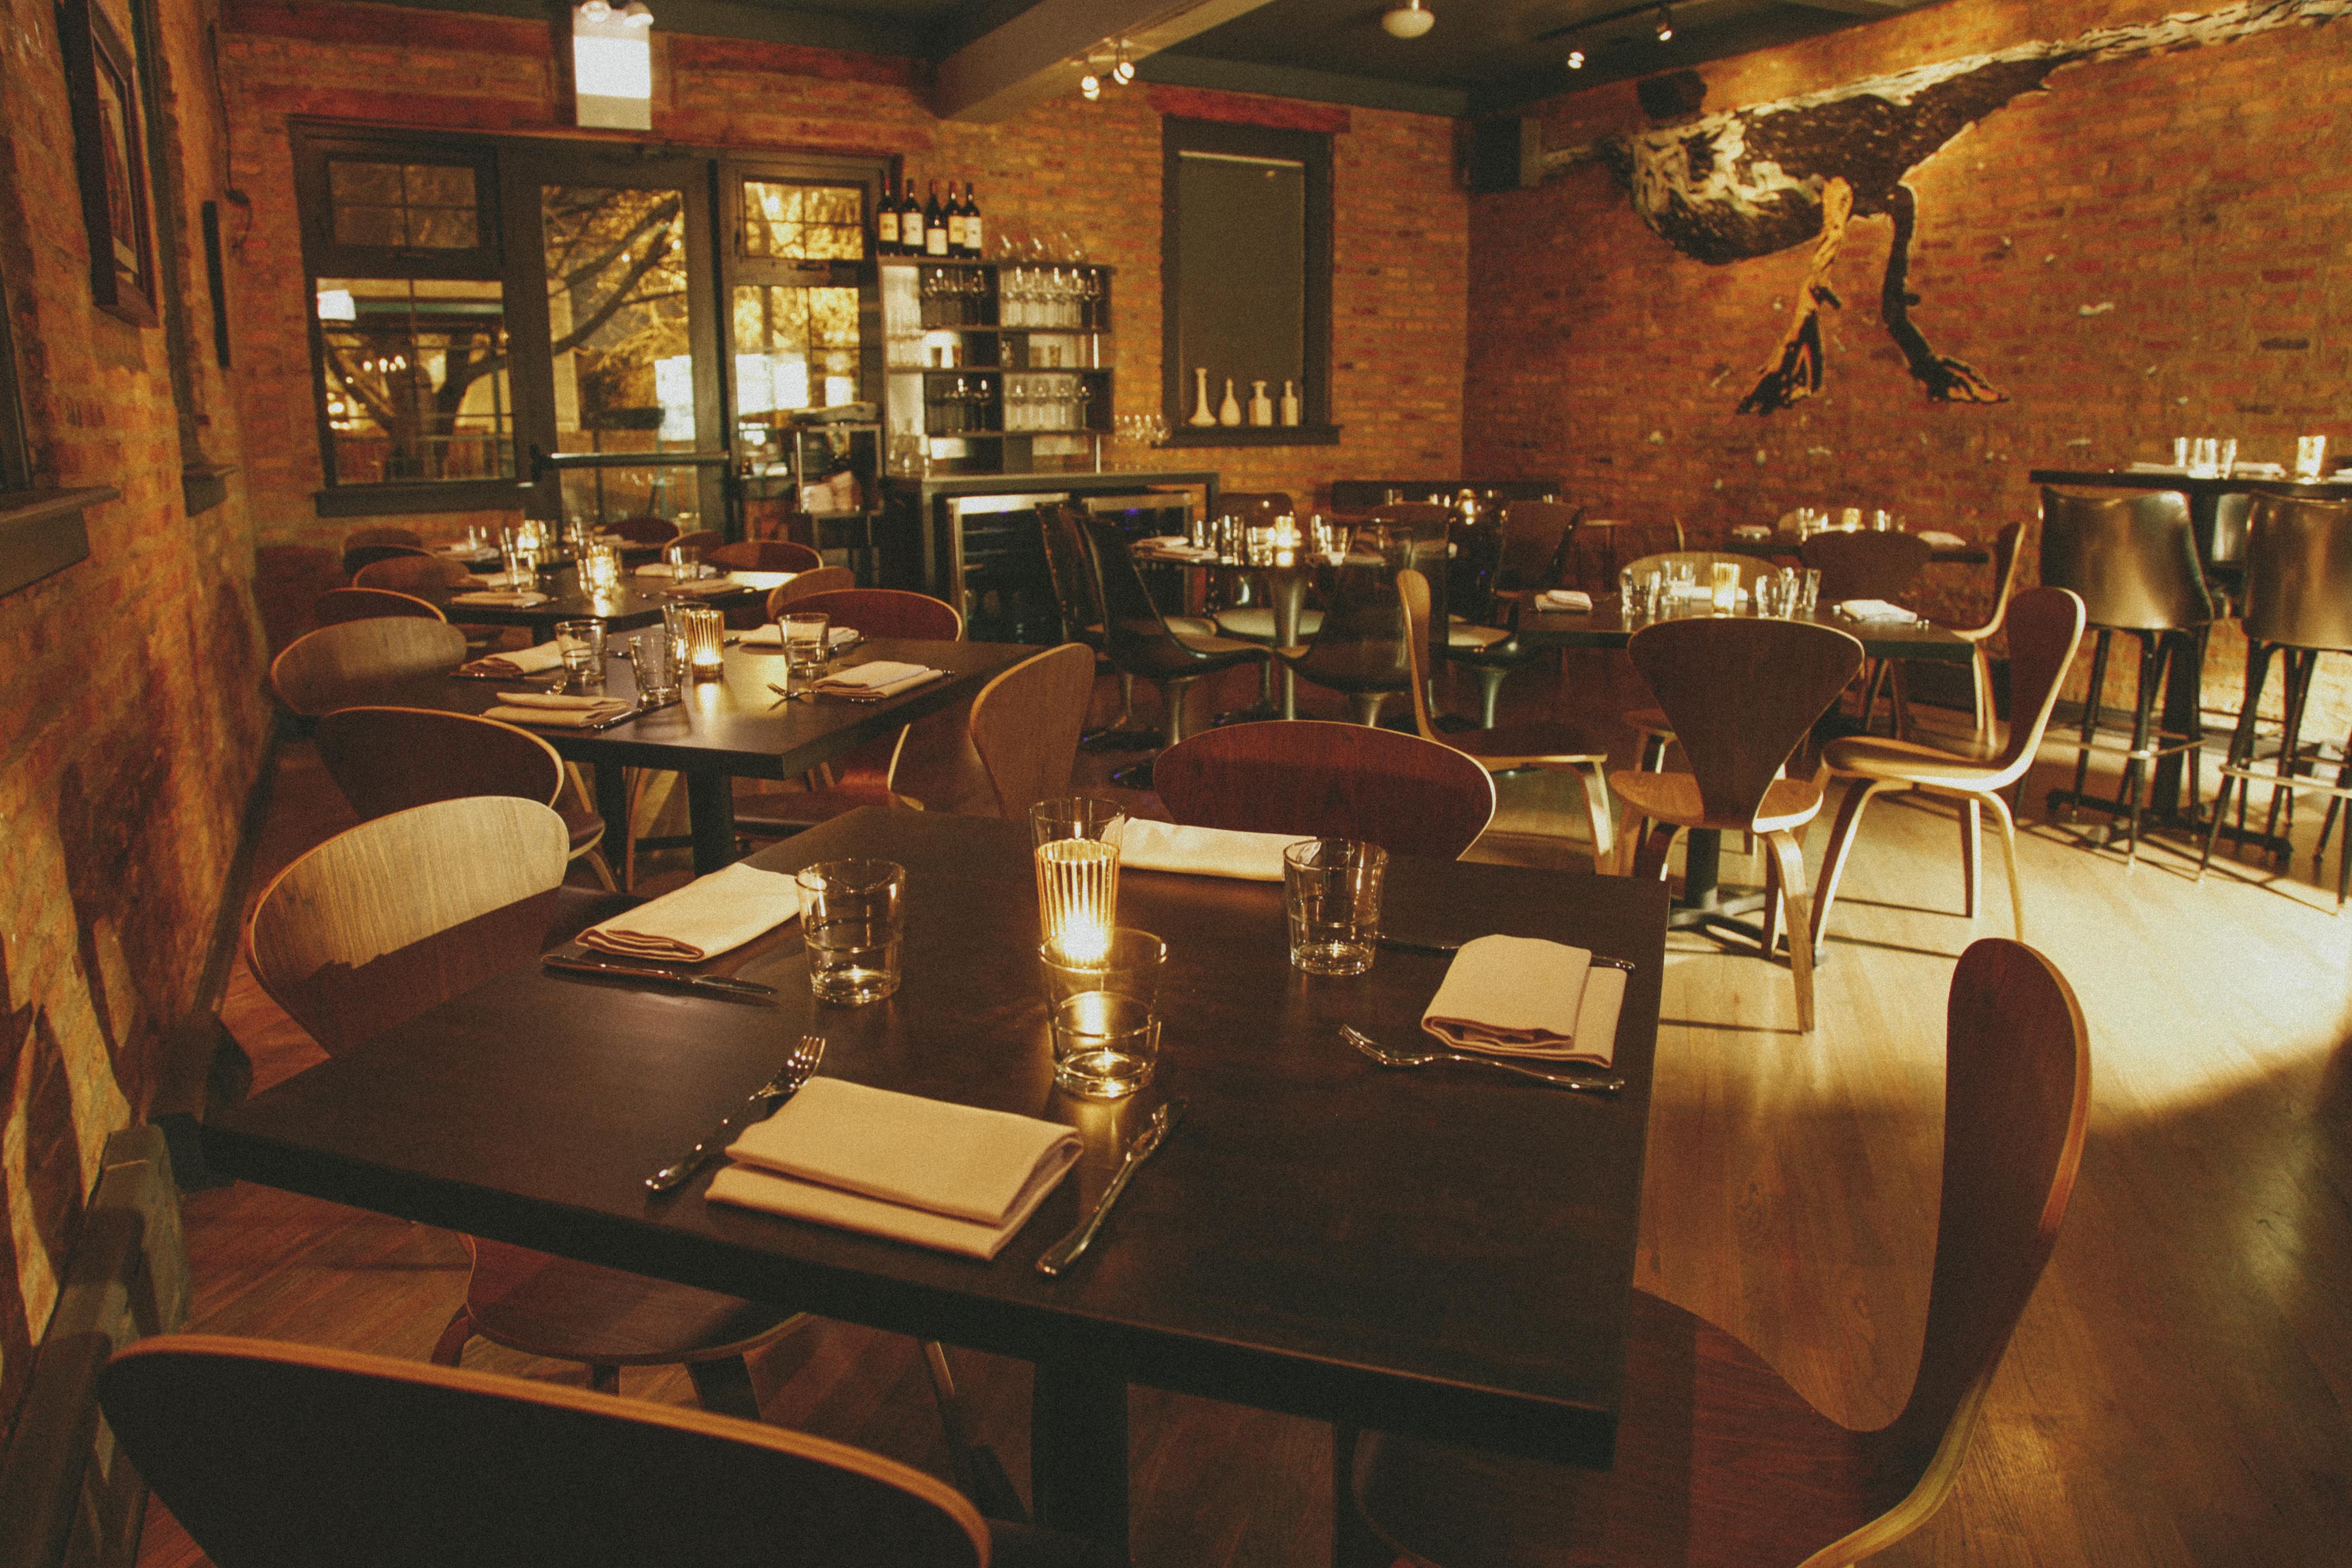 First Look The Duck Inn Is Open For Business Bridgeport